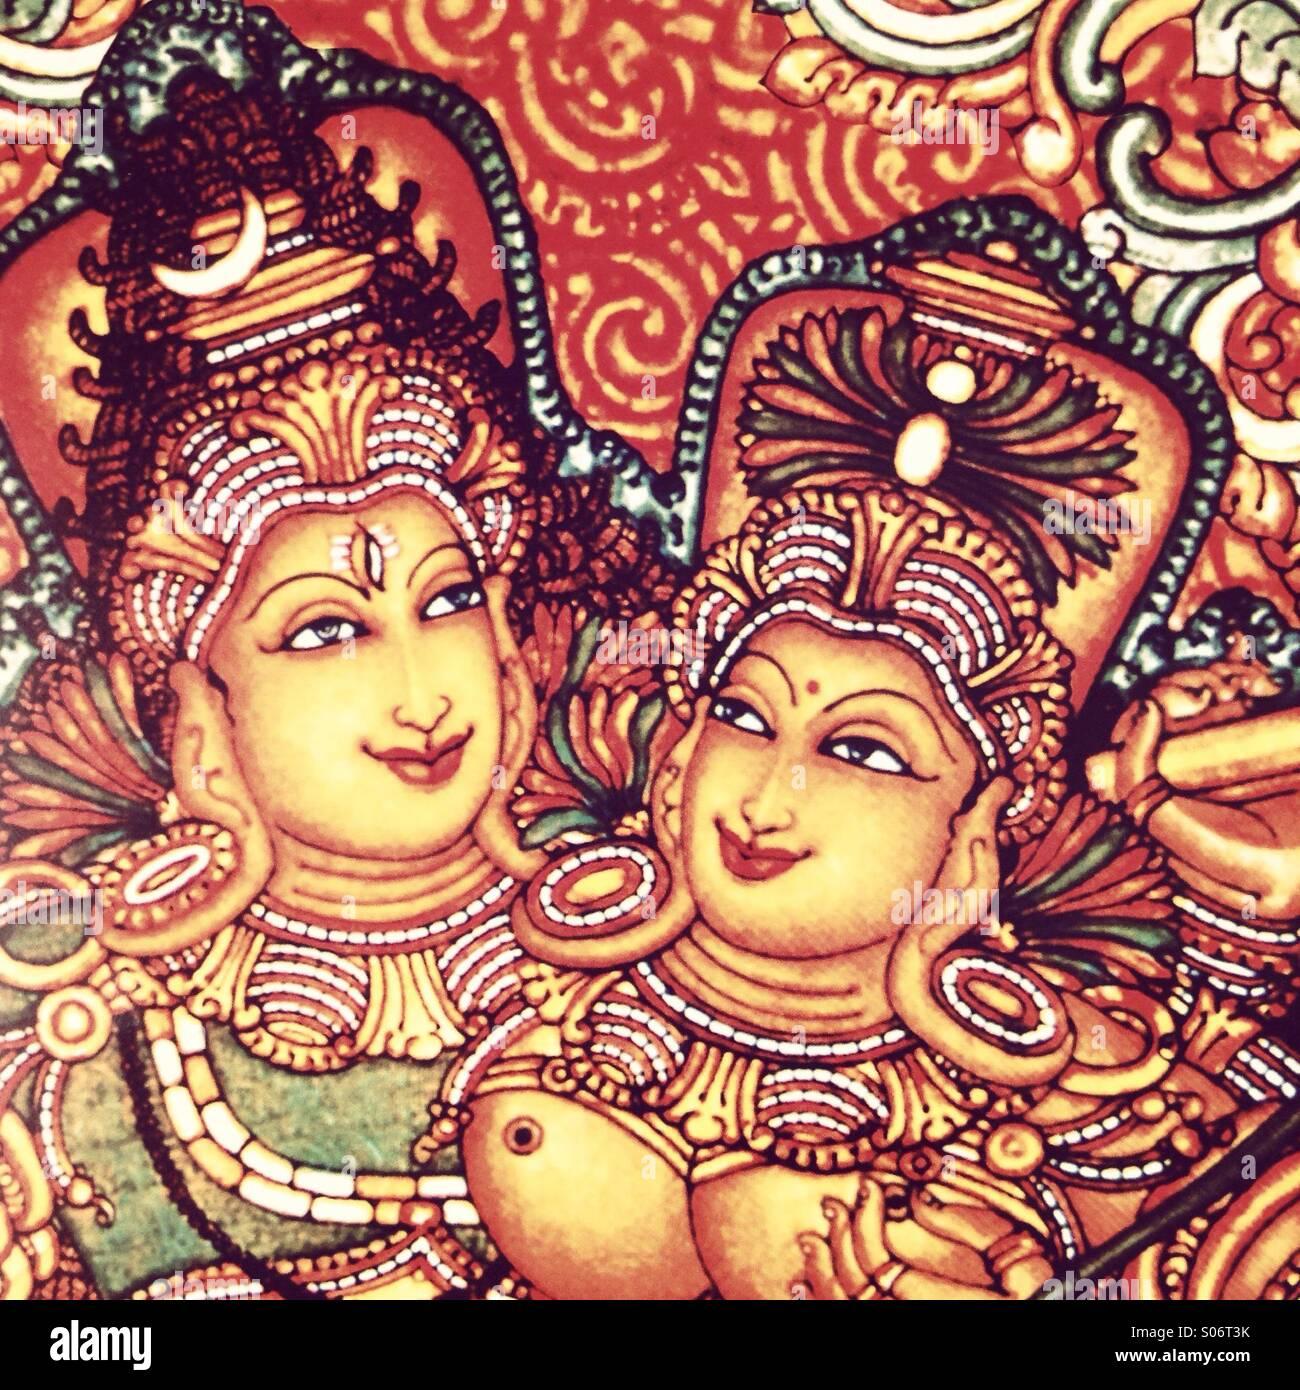 Mural painting of Hindu lord shiva and goddess Parvati - Stock Image